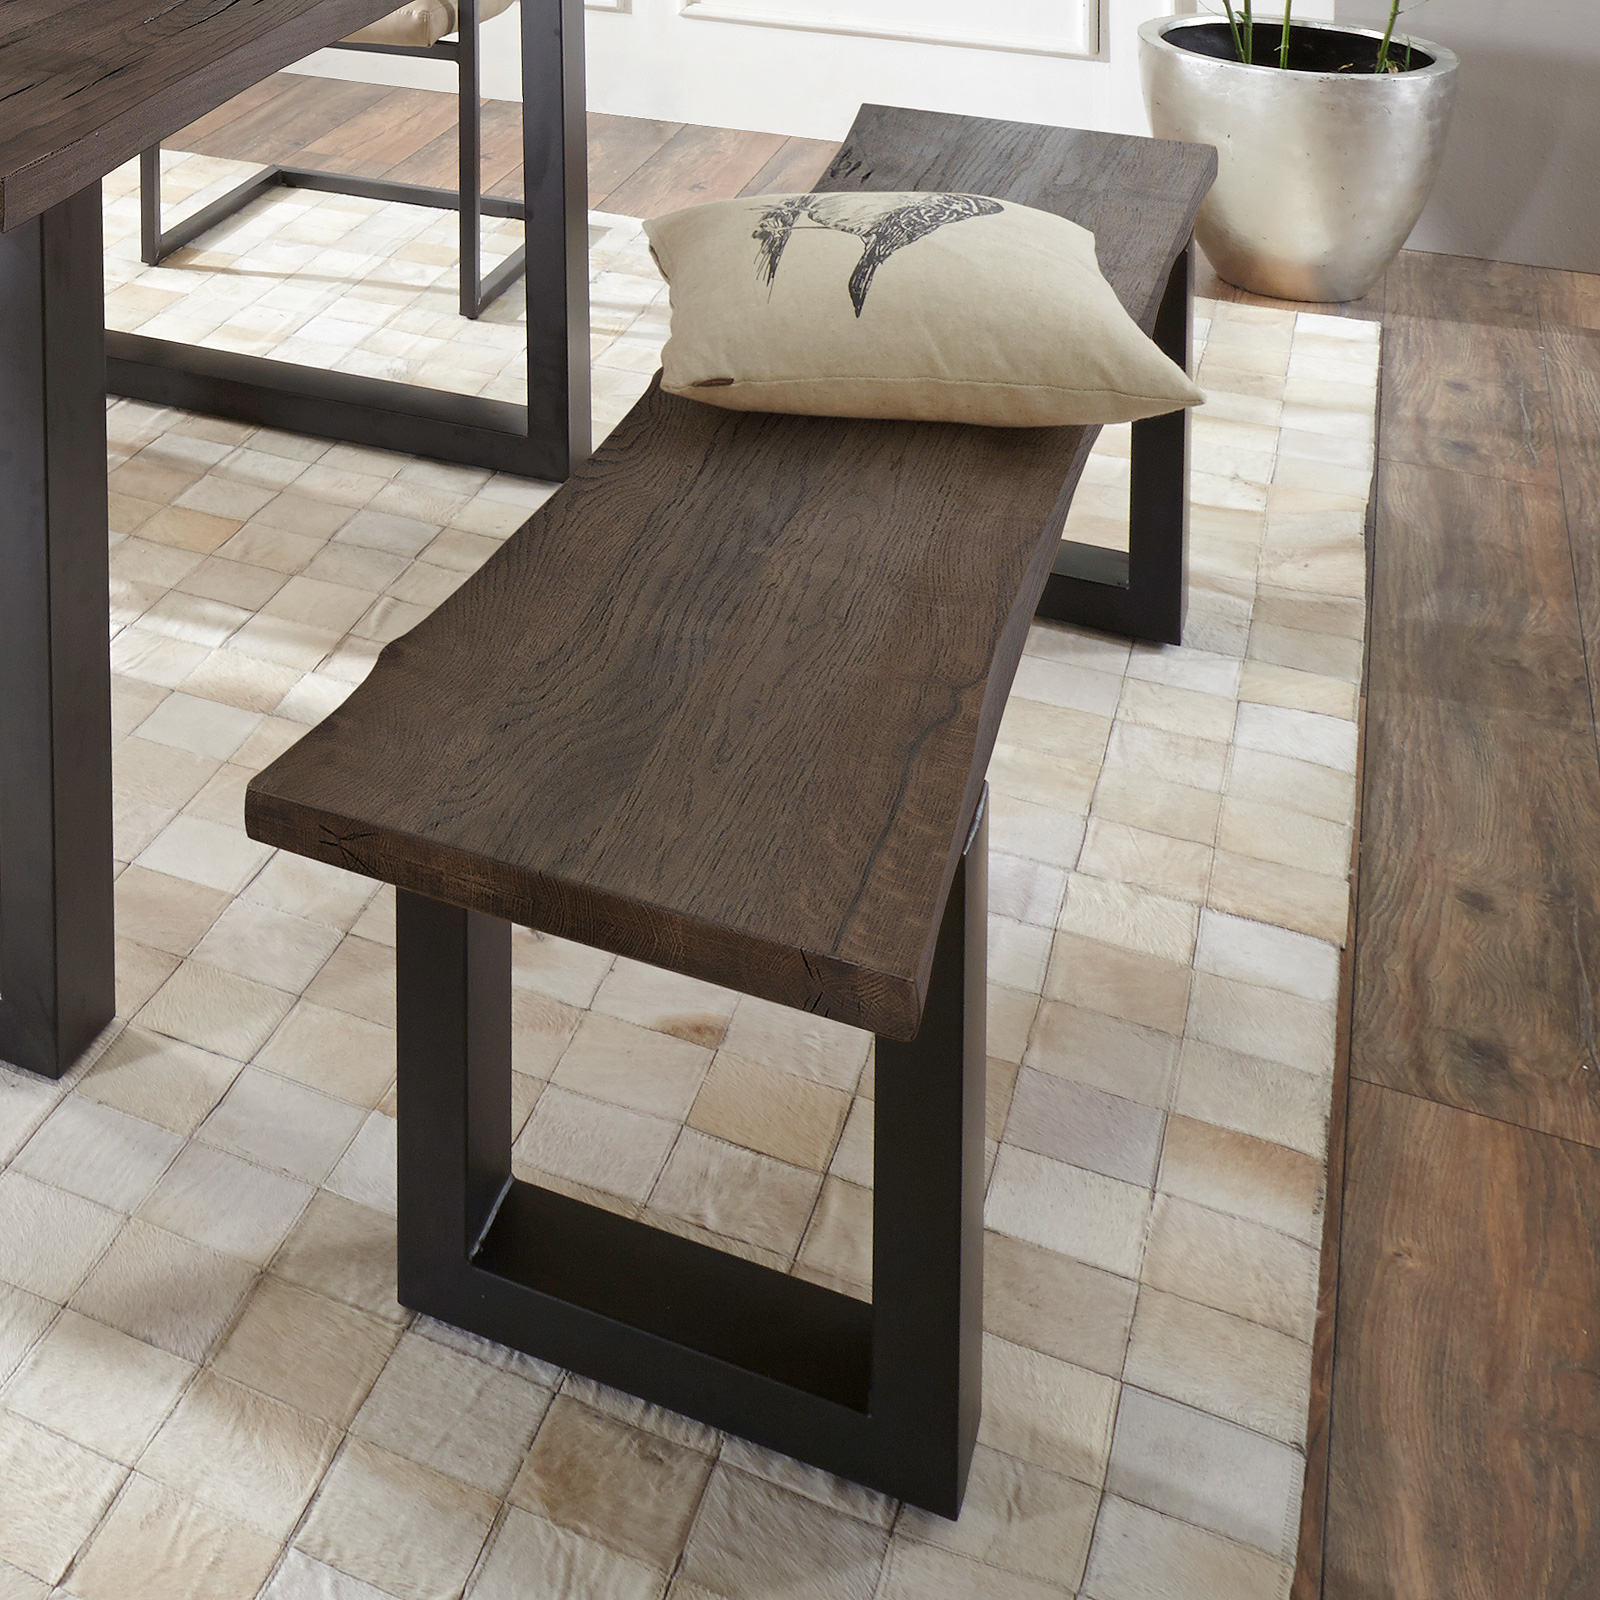 bank maryland sitzbank einzelbank holzbank in akazie. Black Bedroom Furniture Sets. Home Design Ideas